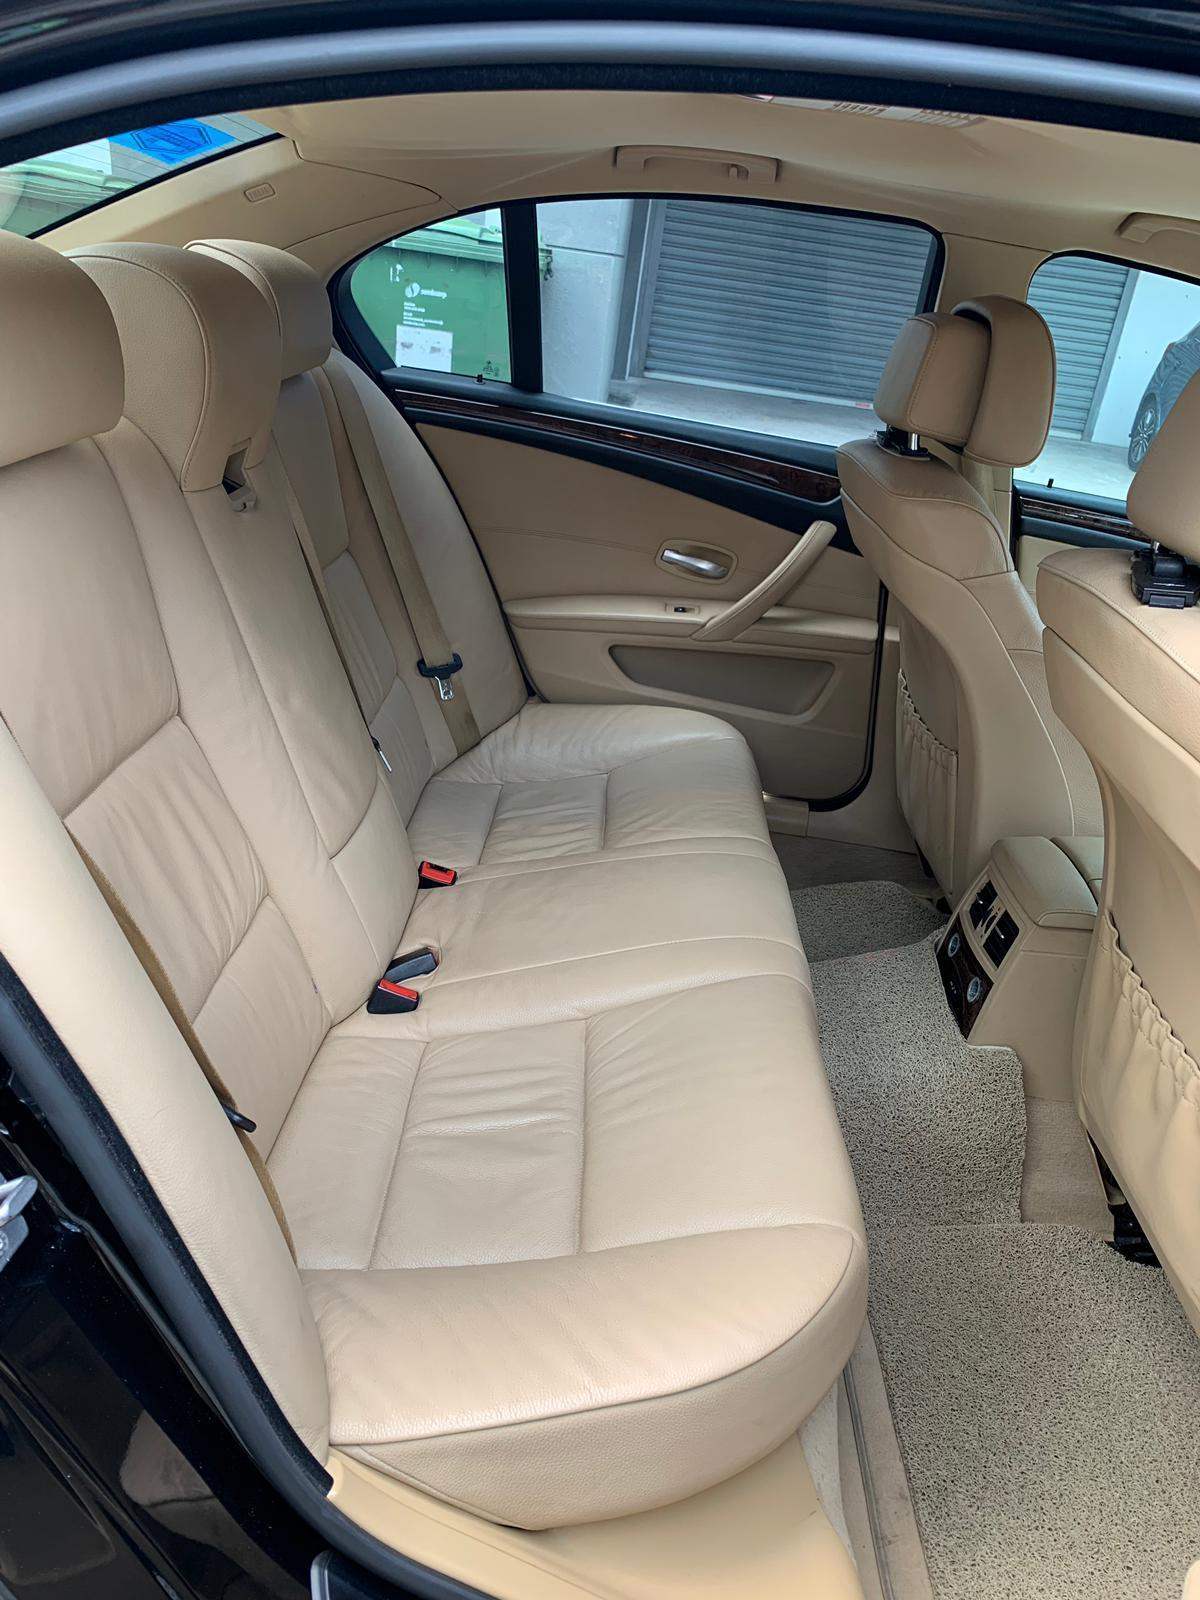 BMW 525i XL Luxury 2010 *Lowest rental rates, good condition!